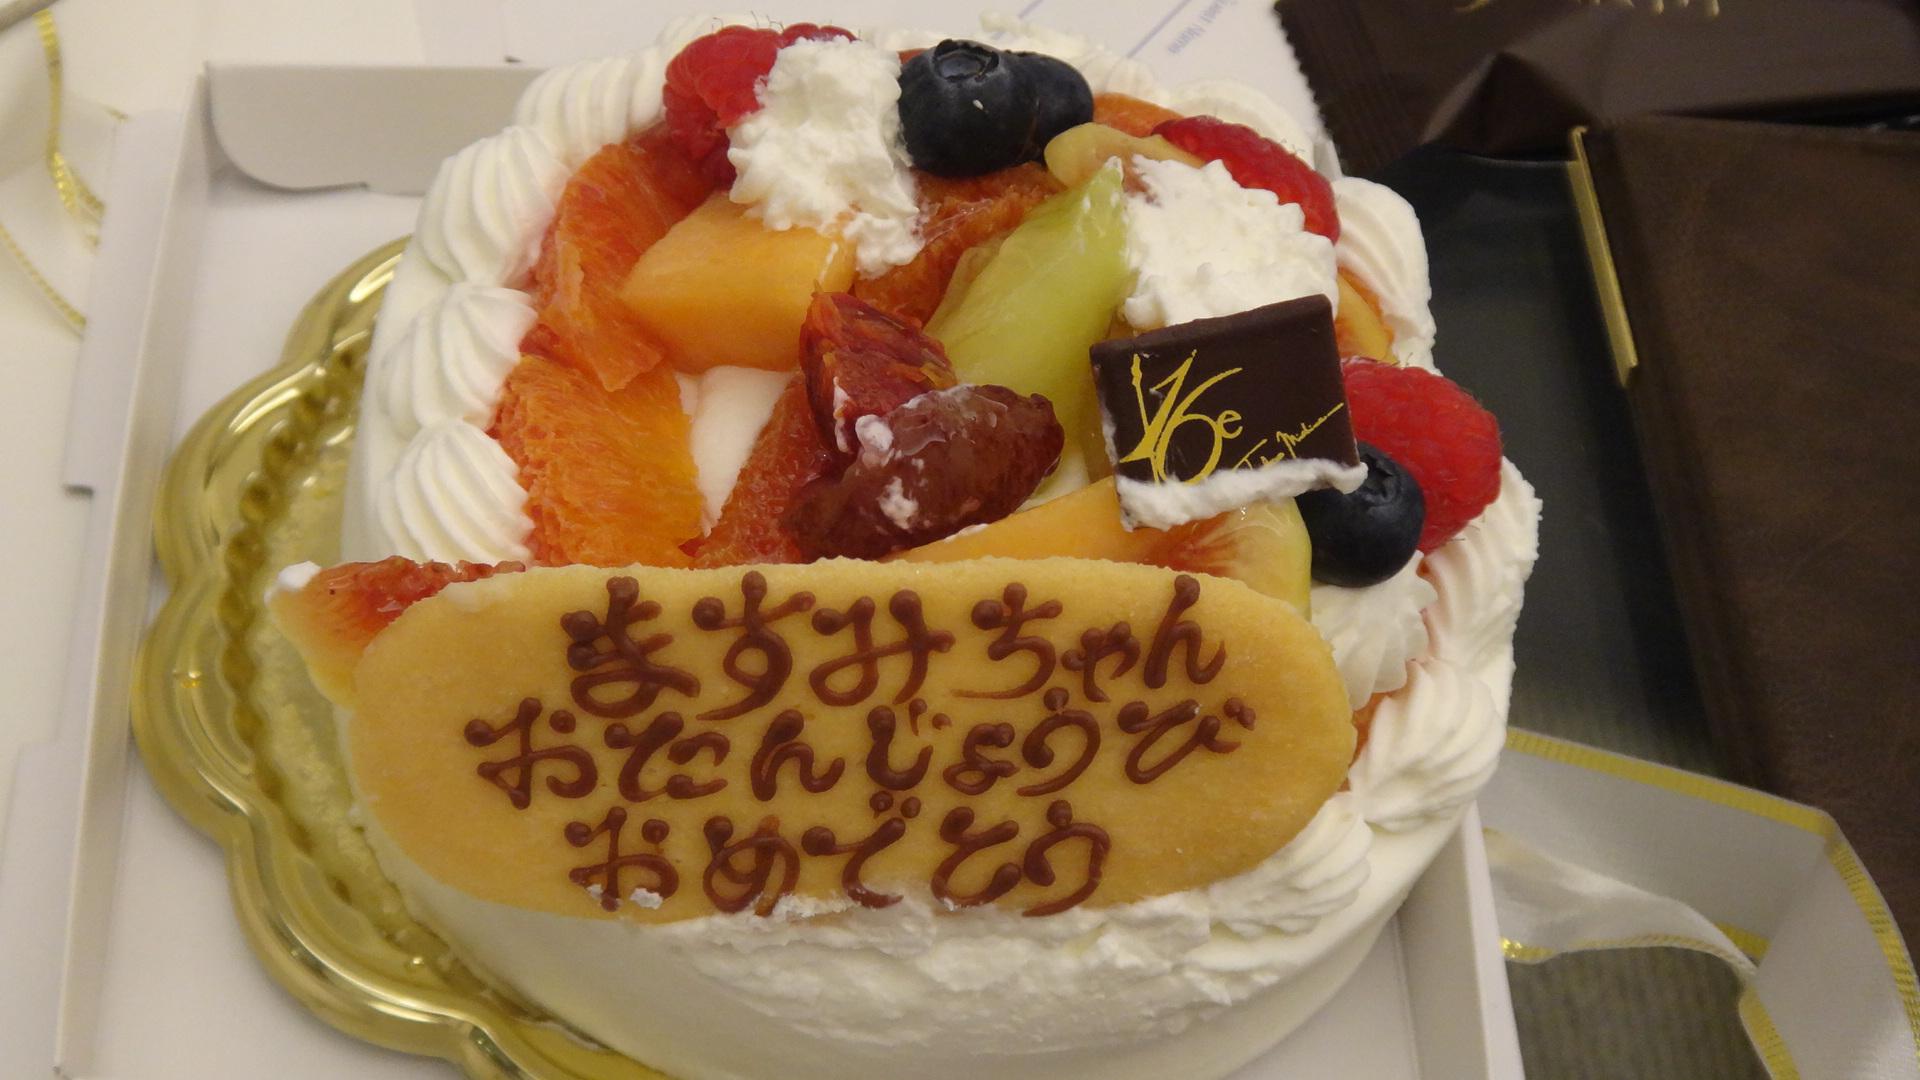 DSC02751欣也ケーキ.JPG